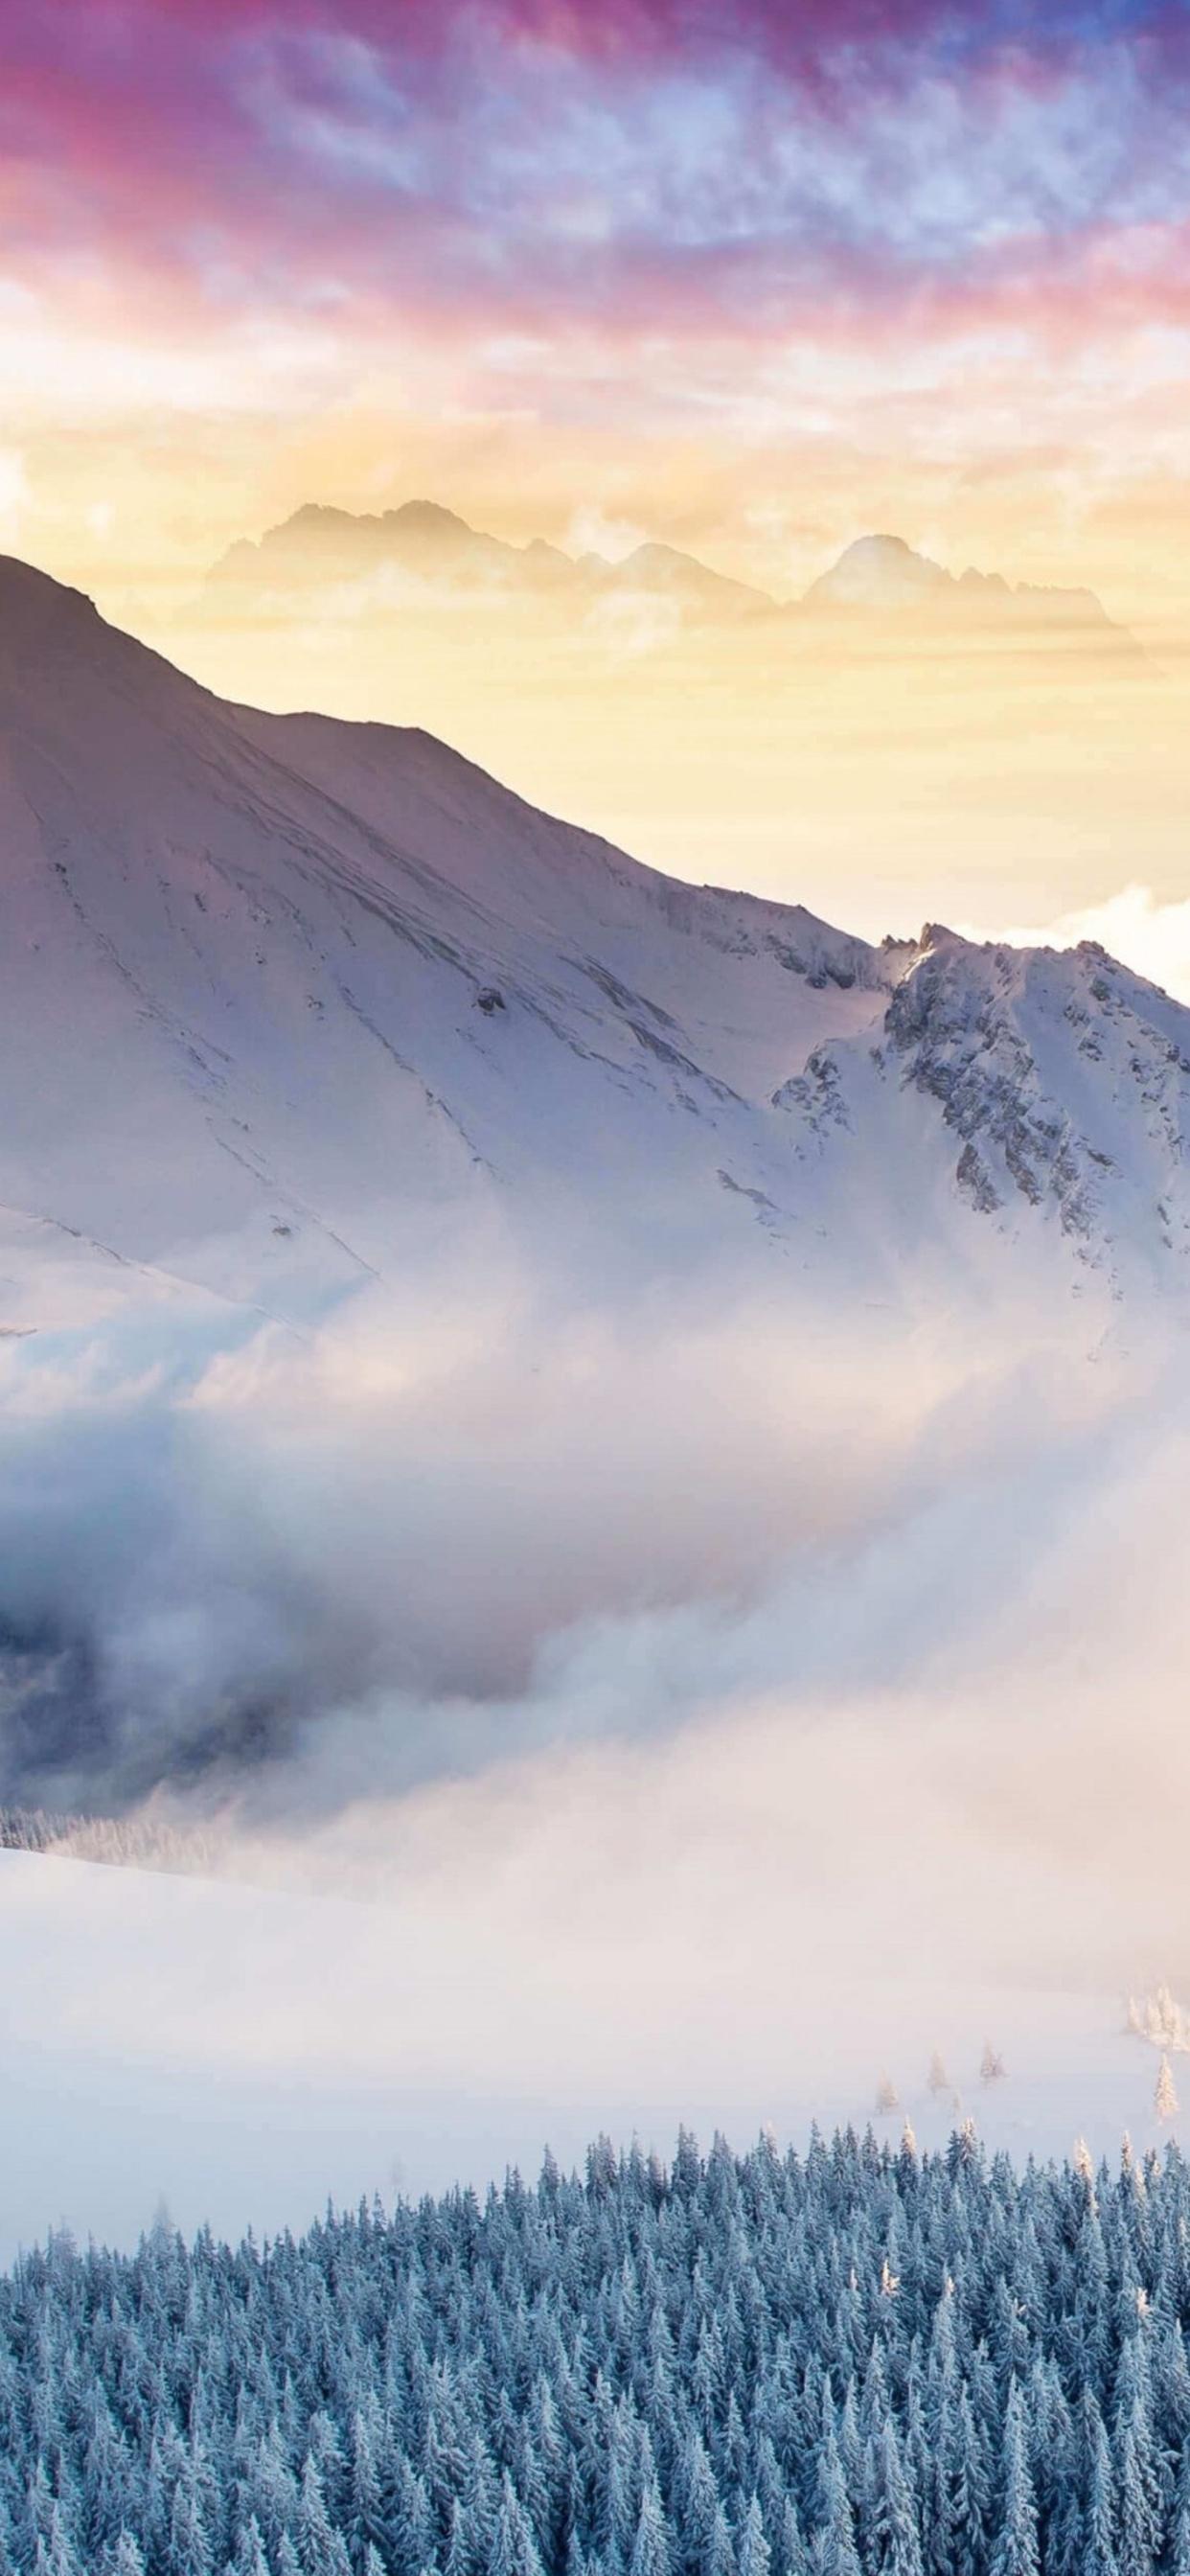 winter-mountain-snow-4k-01.jpg